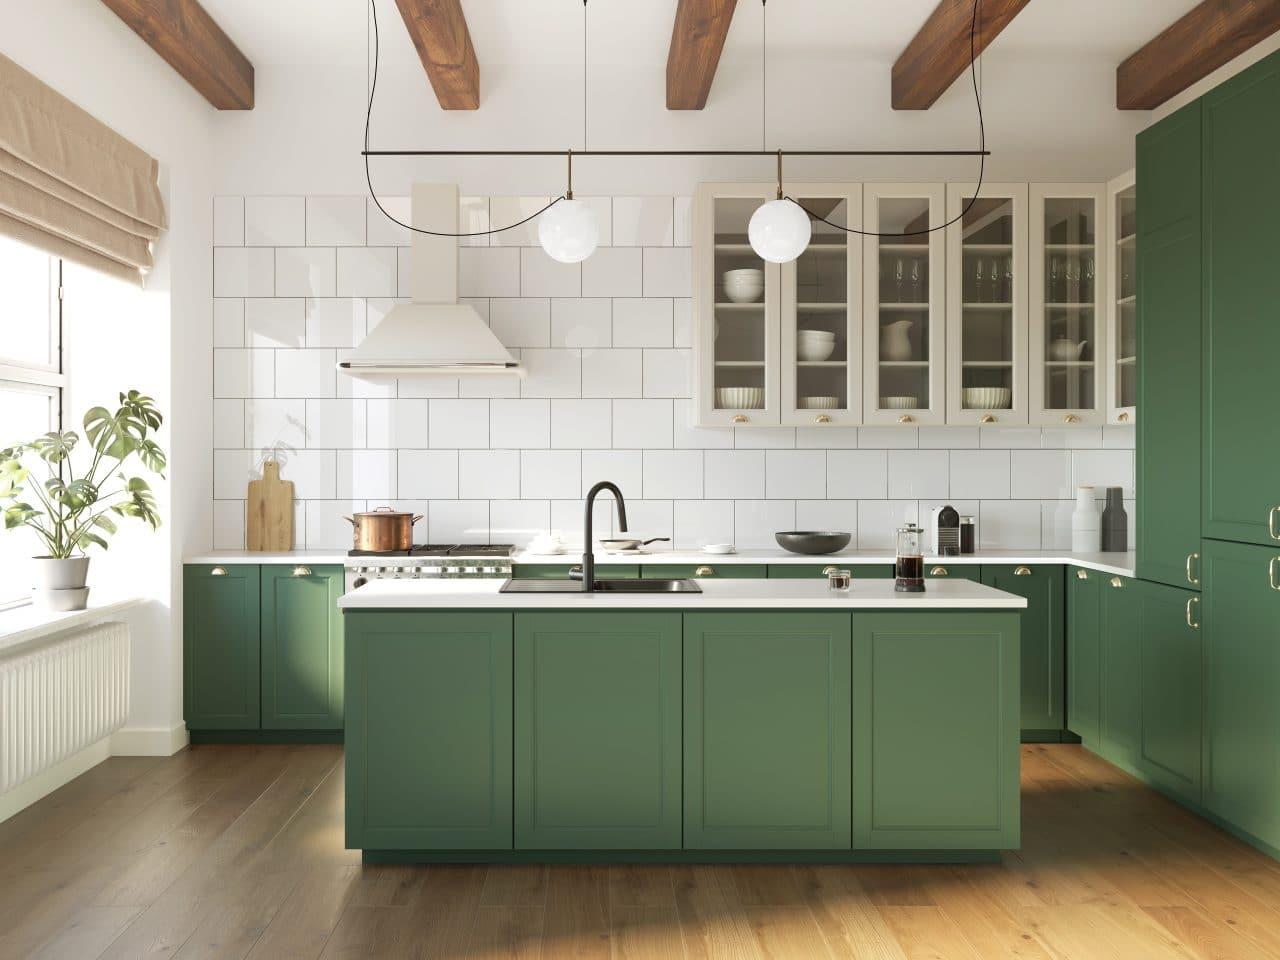 renovation appartement dijon : renovation de cuisine